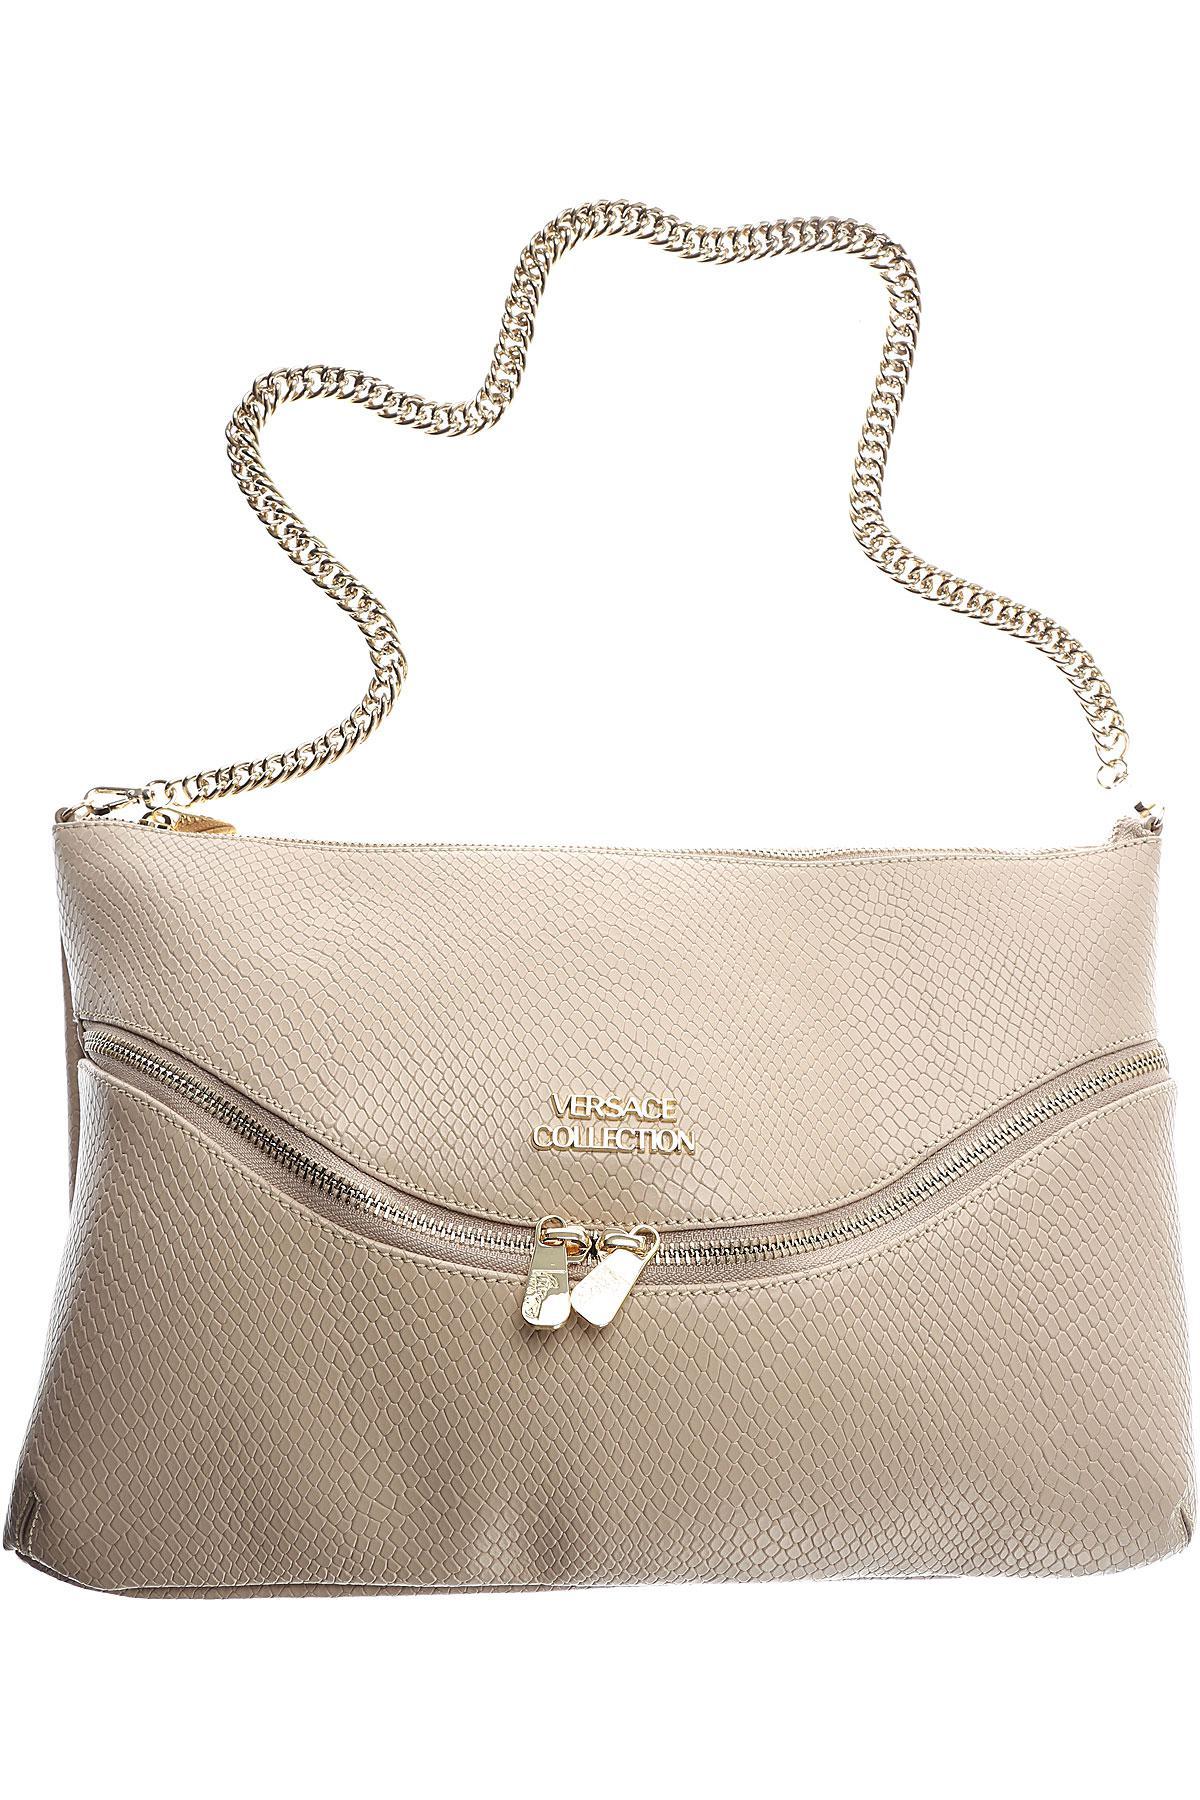 Versace. Women s Handbags 63ada16bc46e0